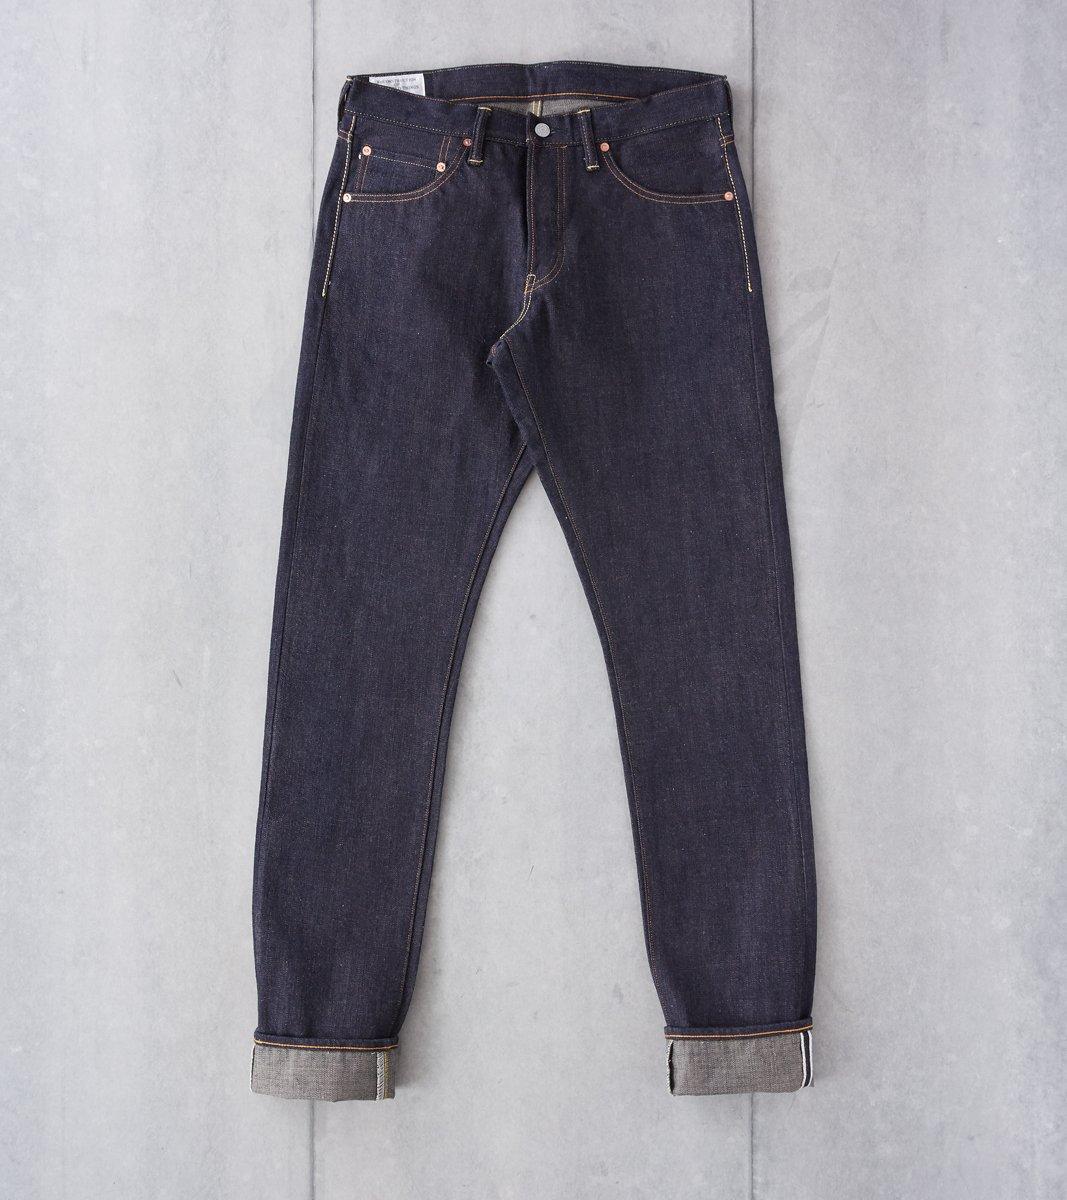 Studio D'Artisan G003 Raw Denim Jeans